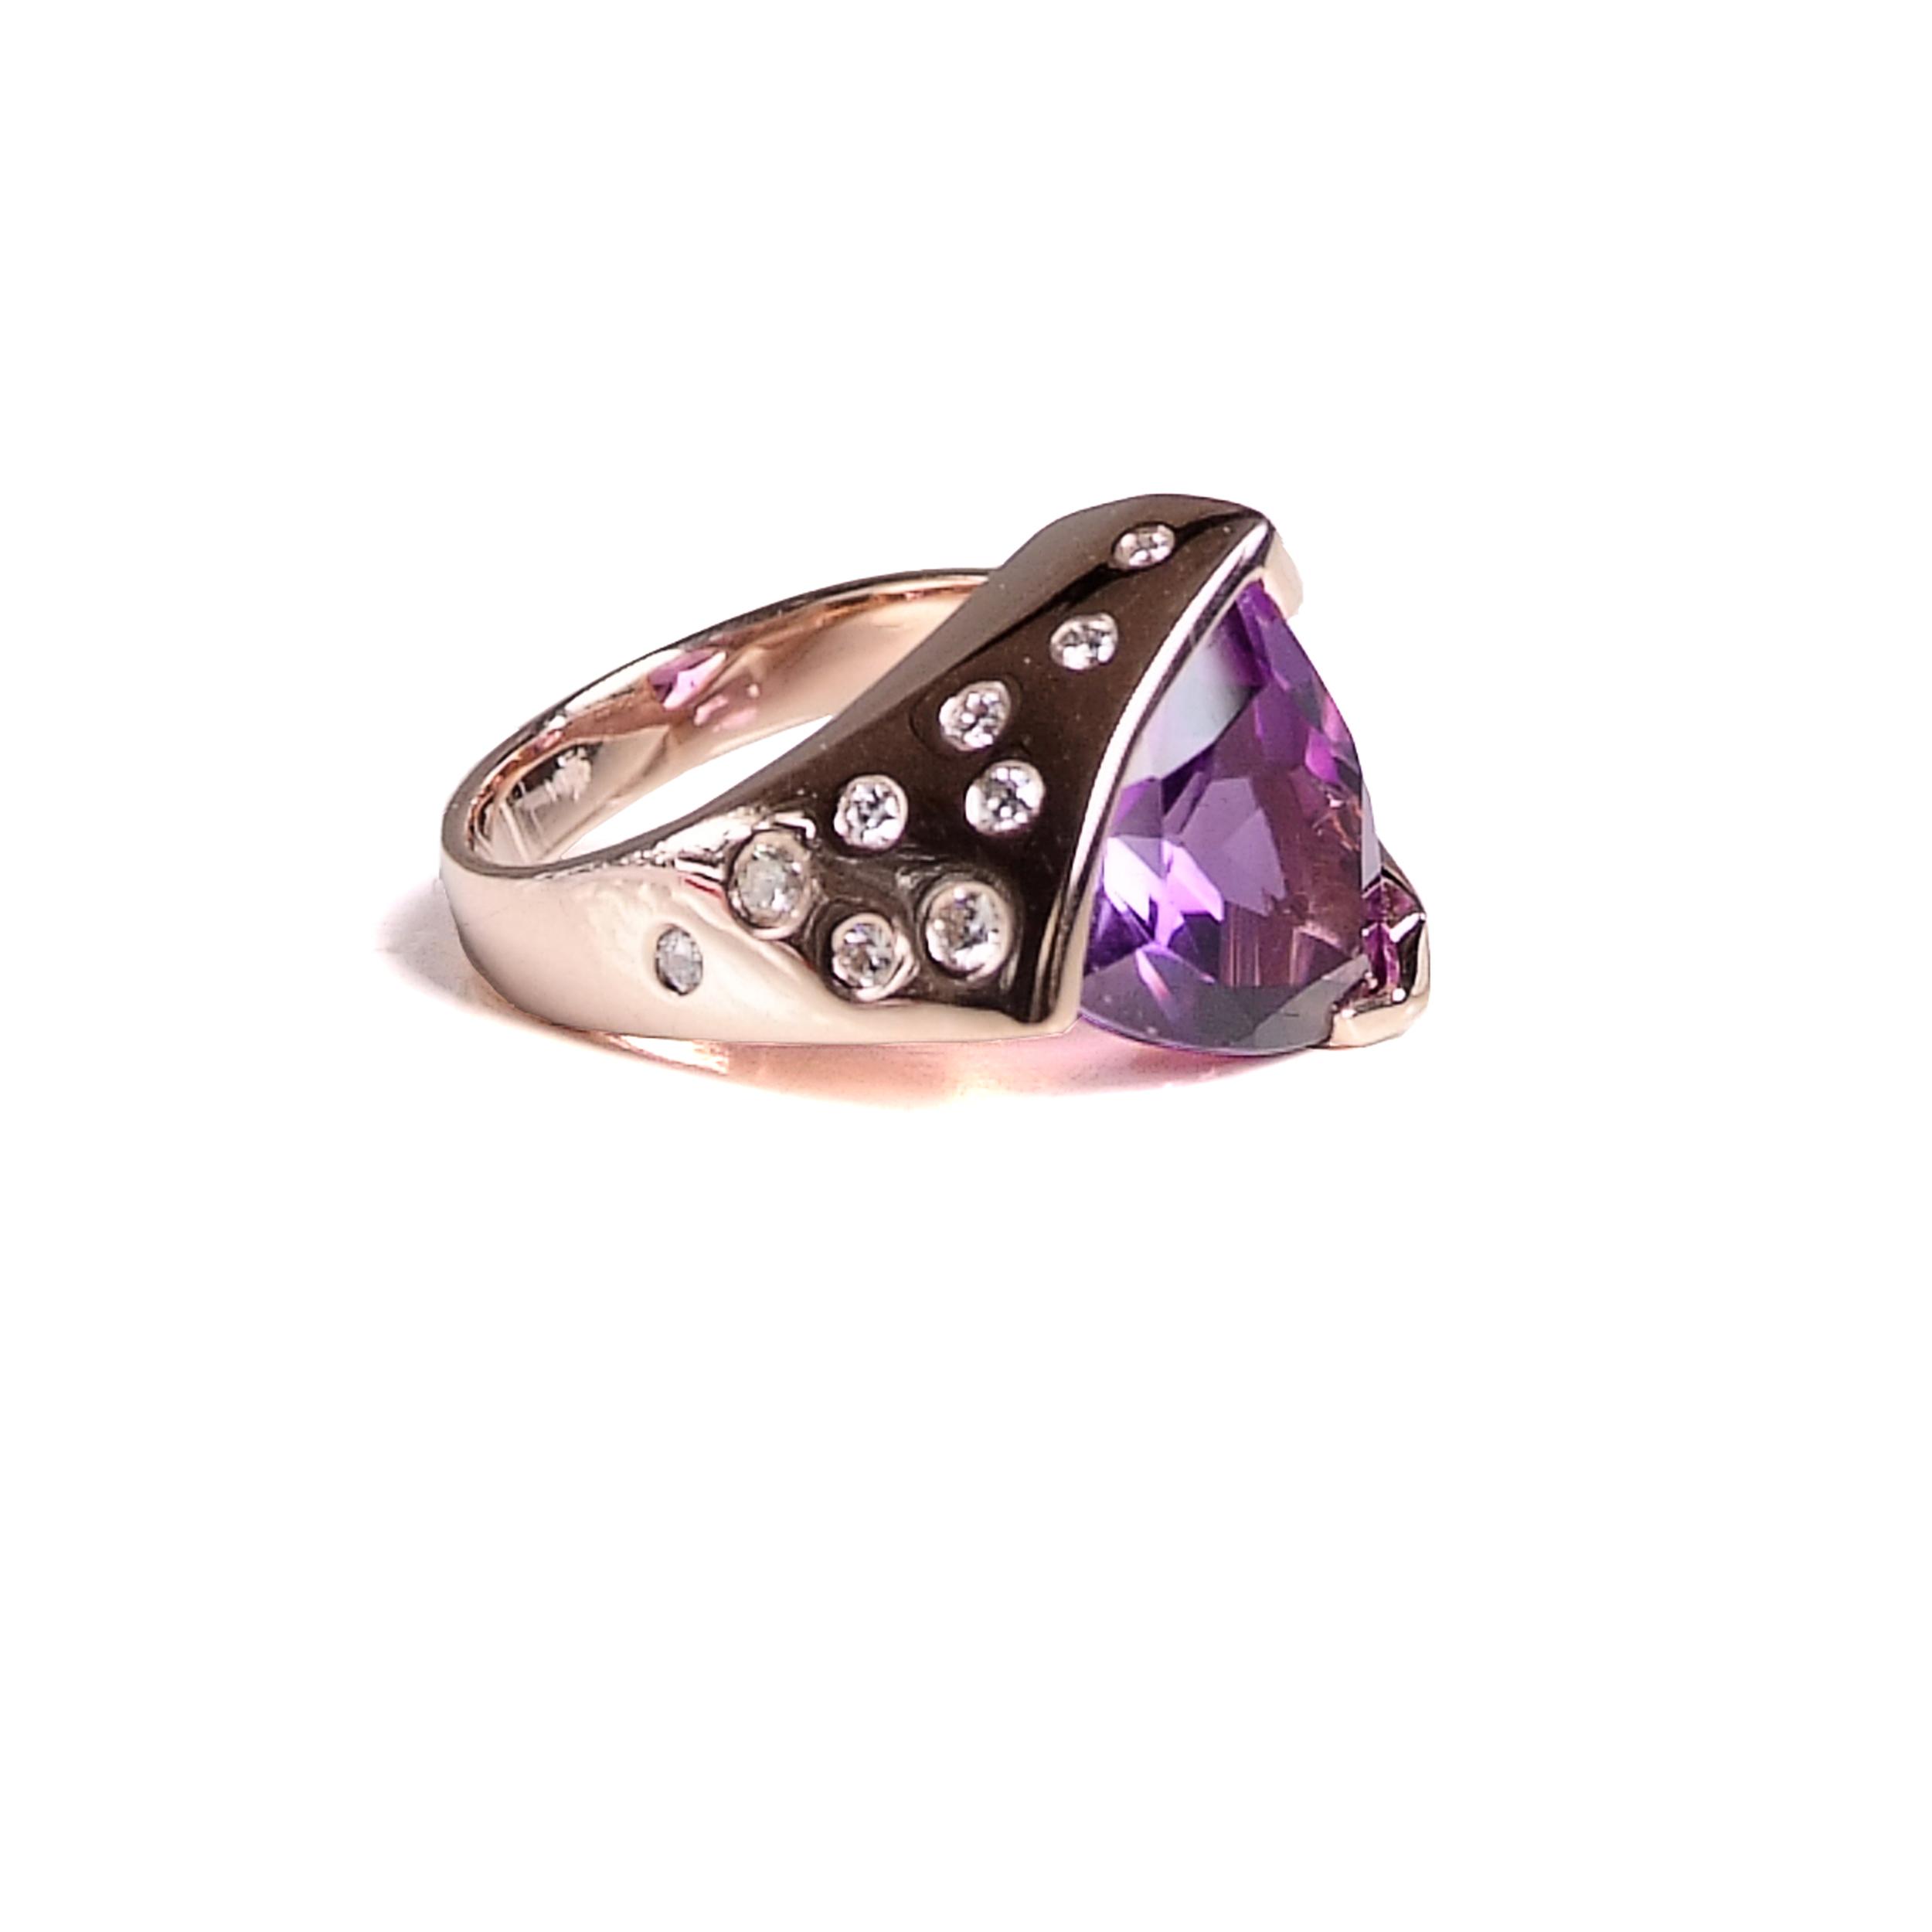 Craft-Revival Jewelers, rose gold ring, amethyst ring, flush set diamonds